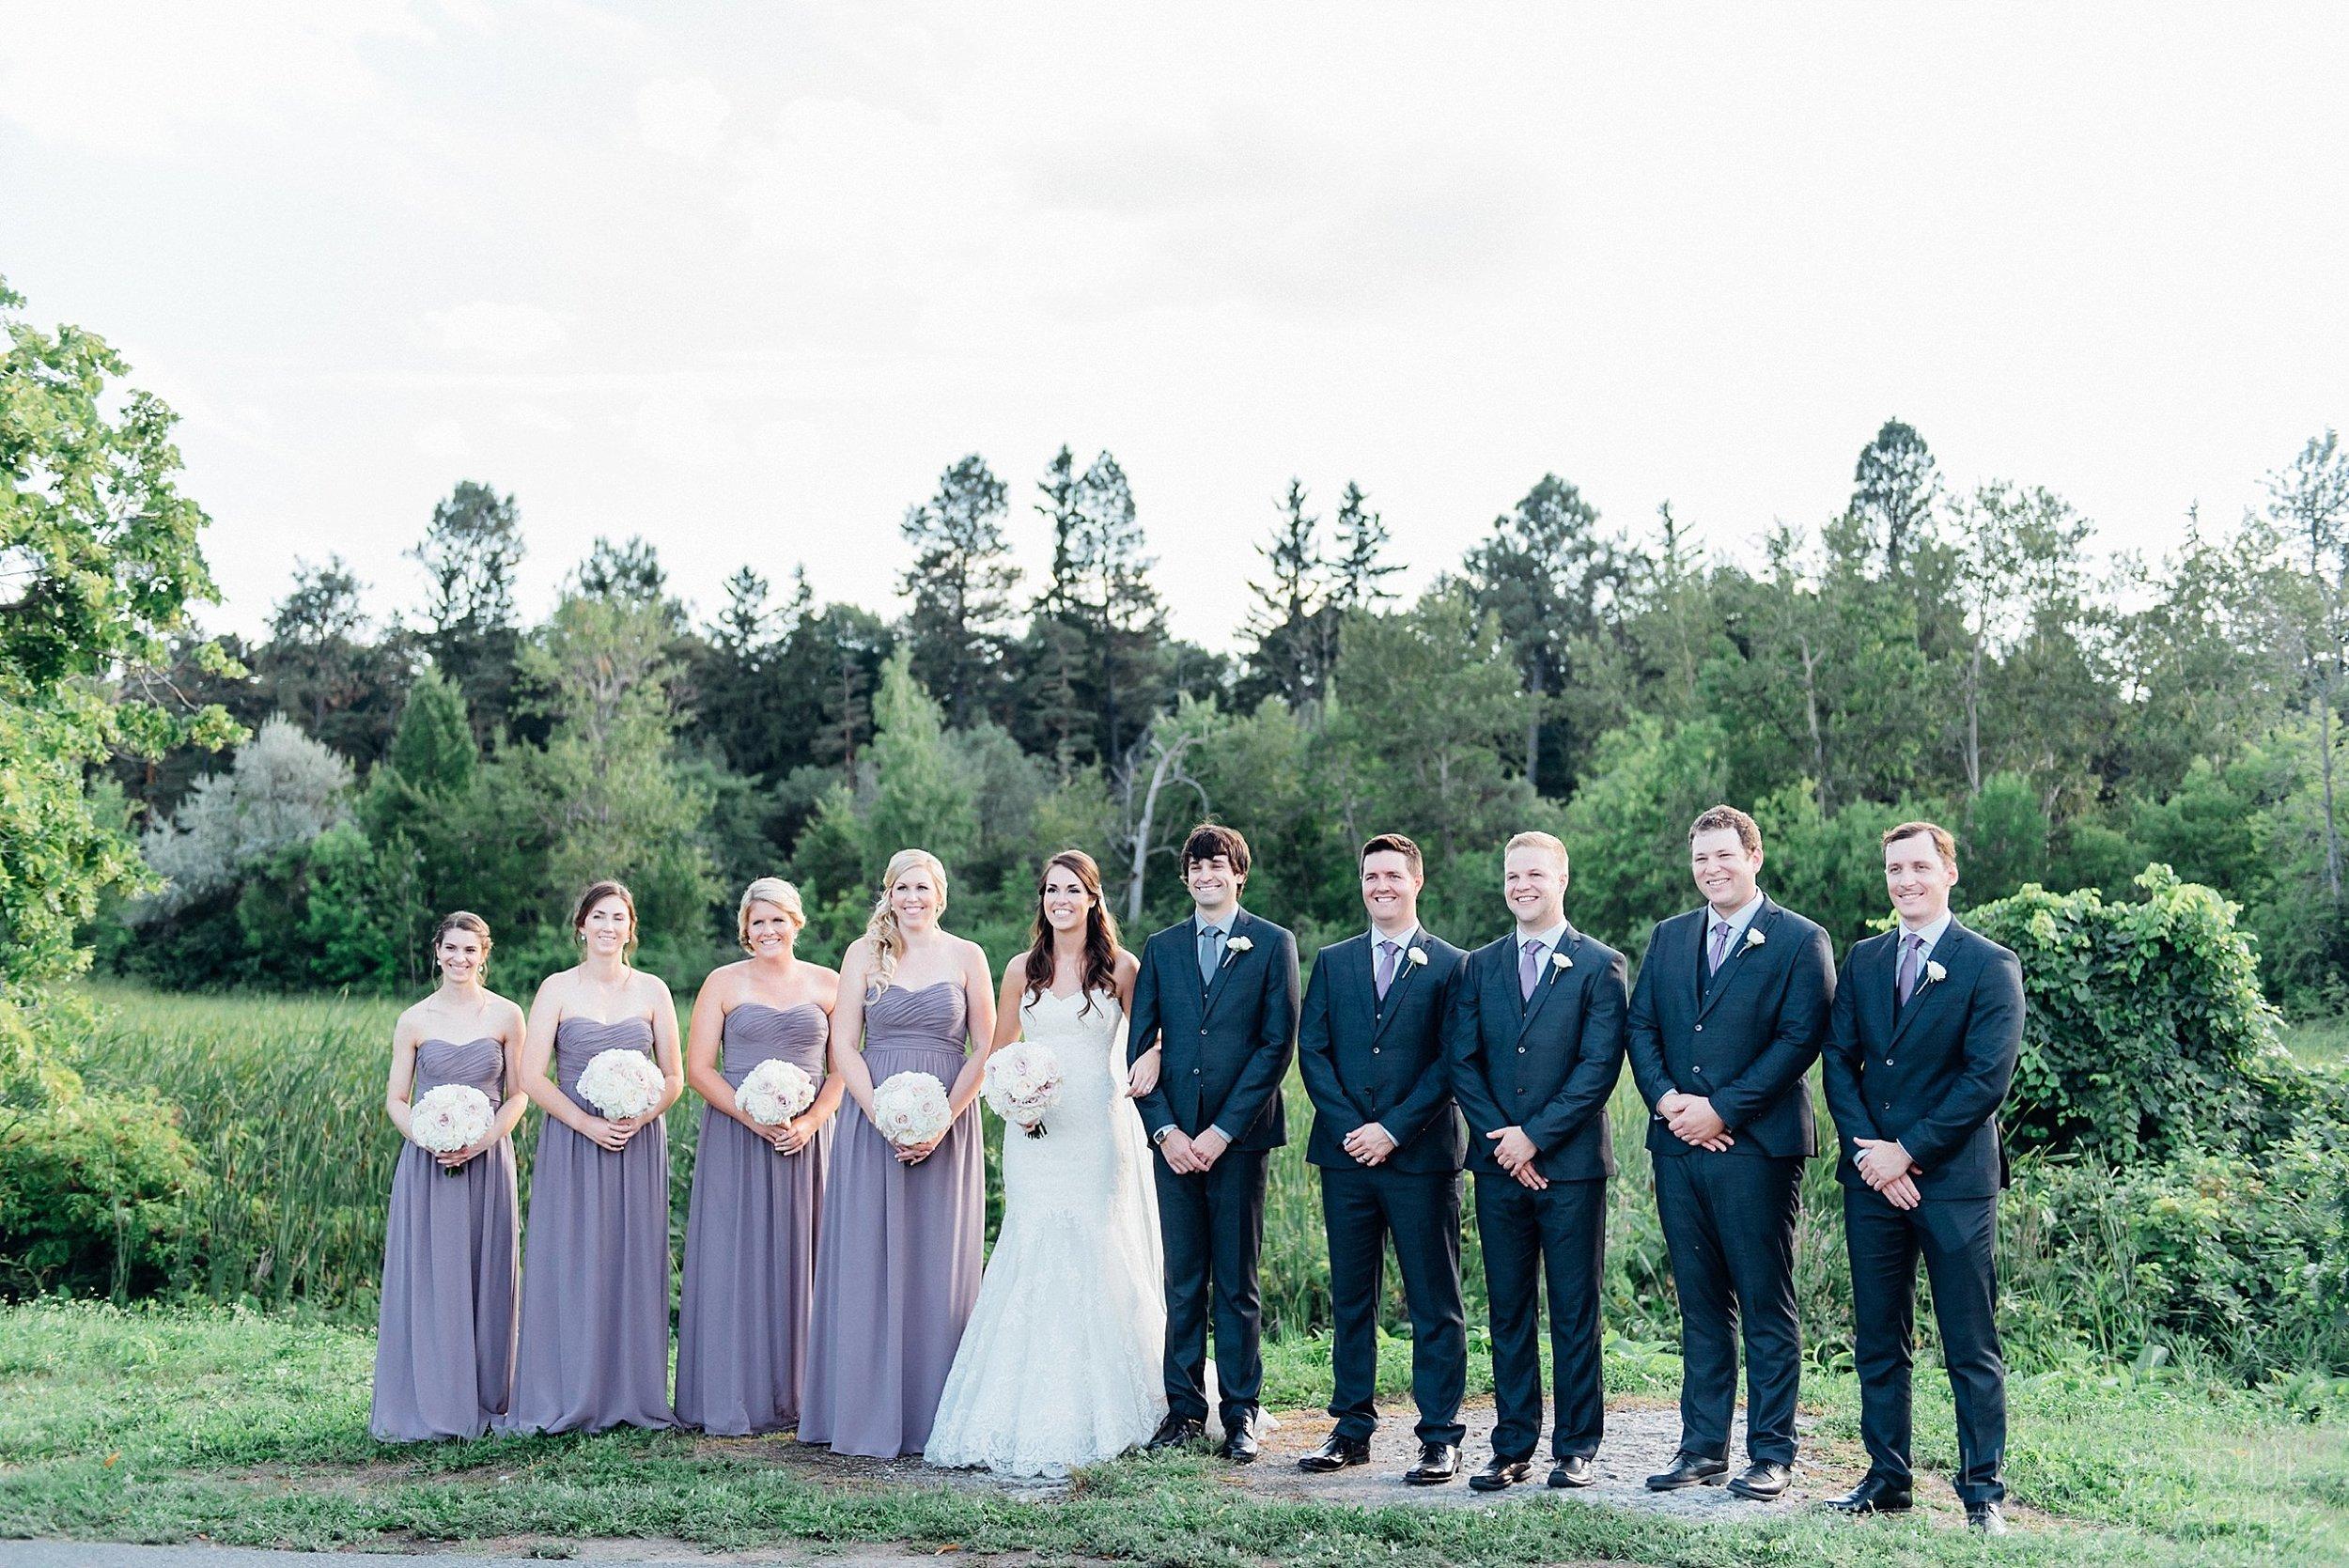 Ali & Batoul Photography - Documentary Fine Art Ottawa Wedding Photography_0041.jpg